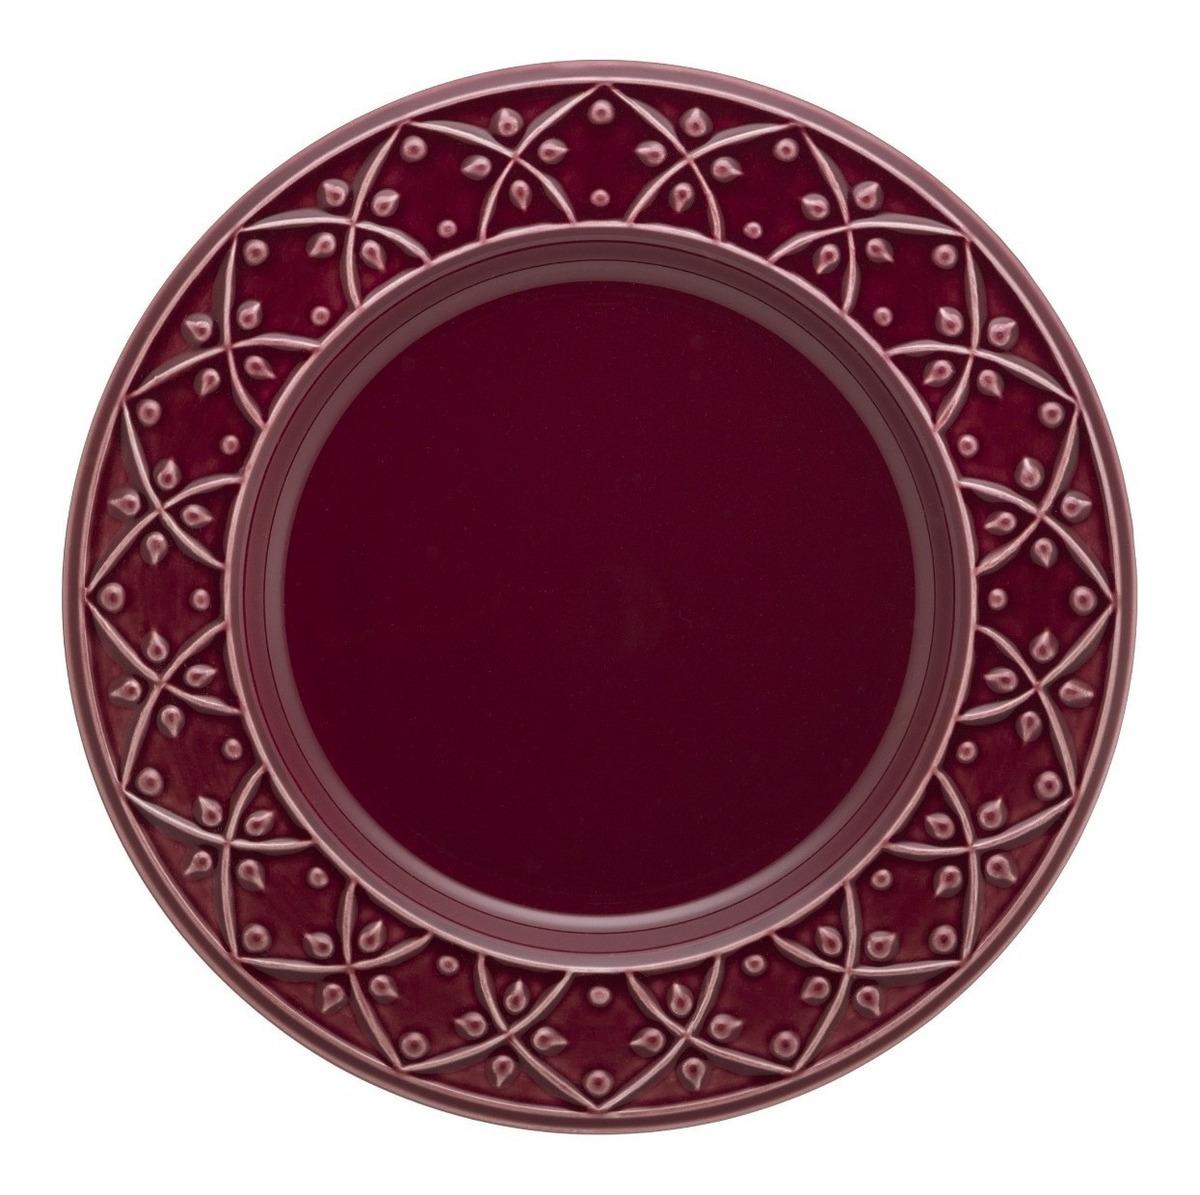 Set 6 Platos Playo Ceramica Oxford Corvina Bordo Finorelieve